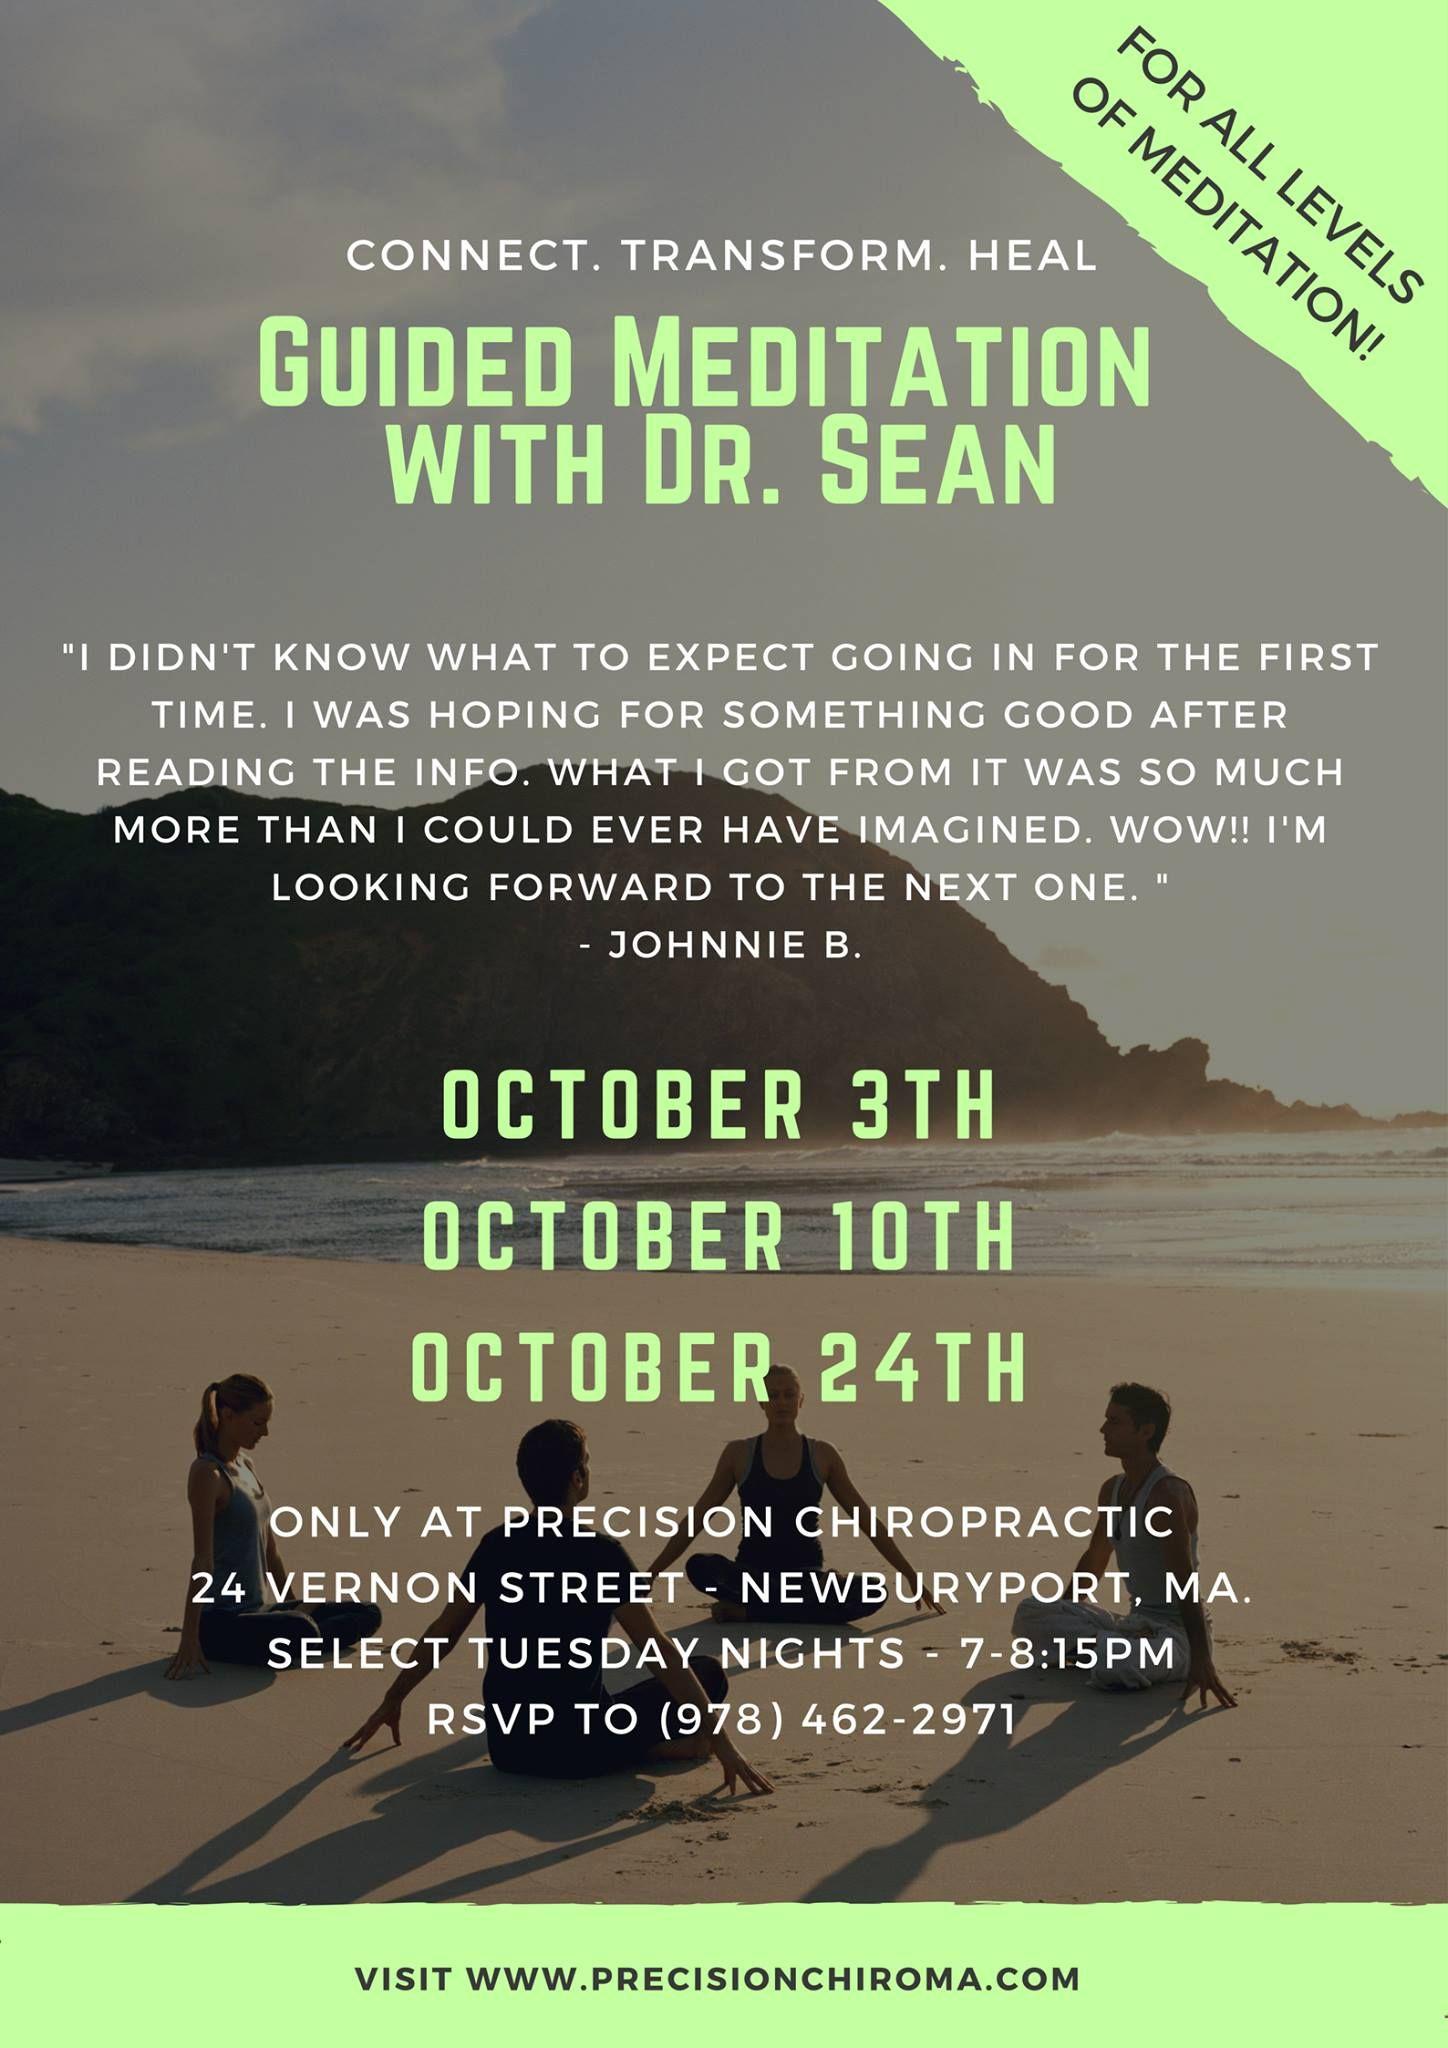 chiropractic yoga meditation marketing | healthcare marketing ideas